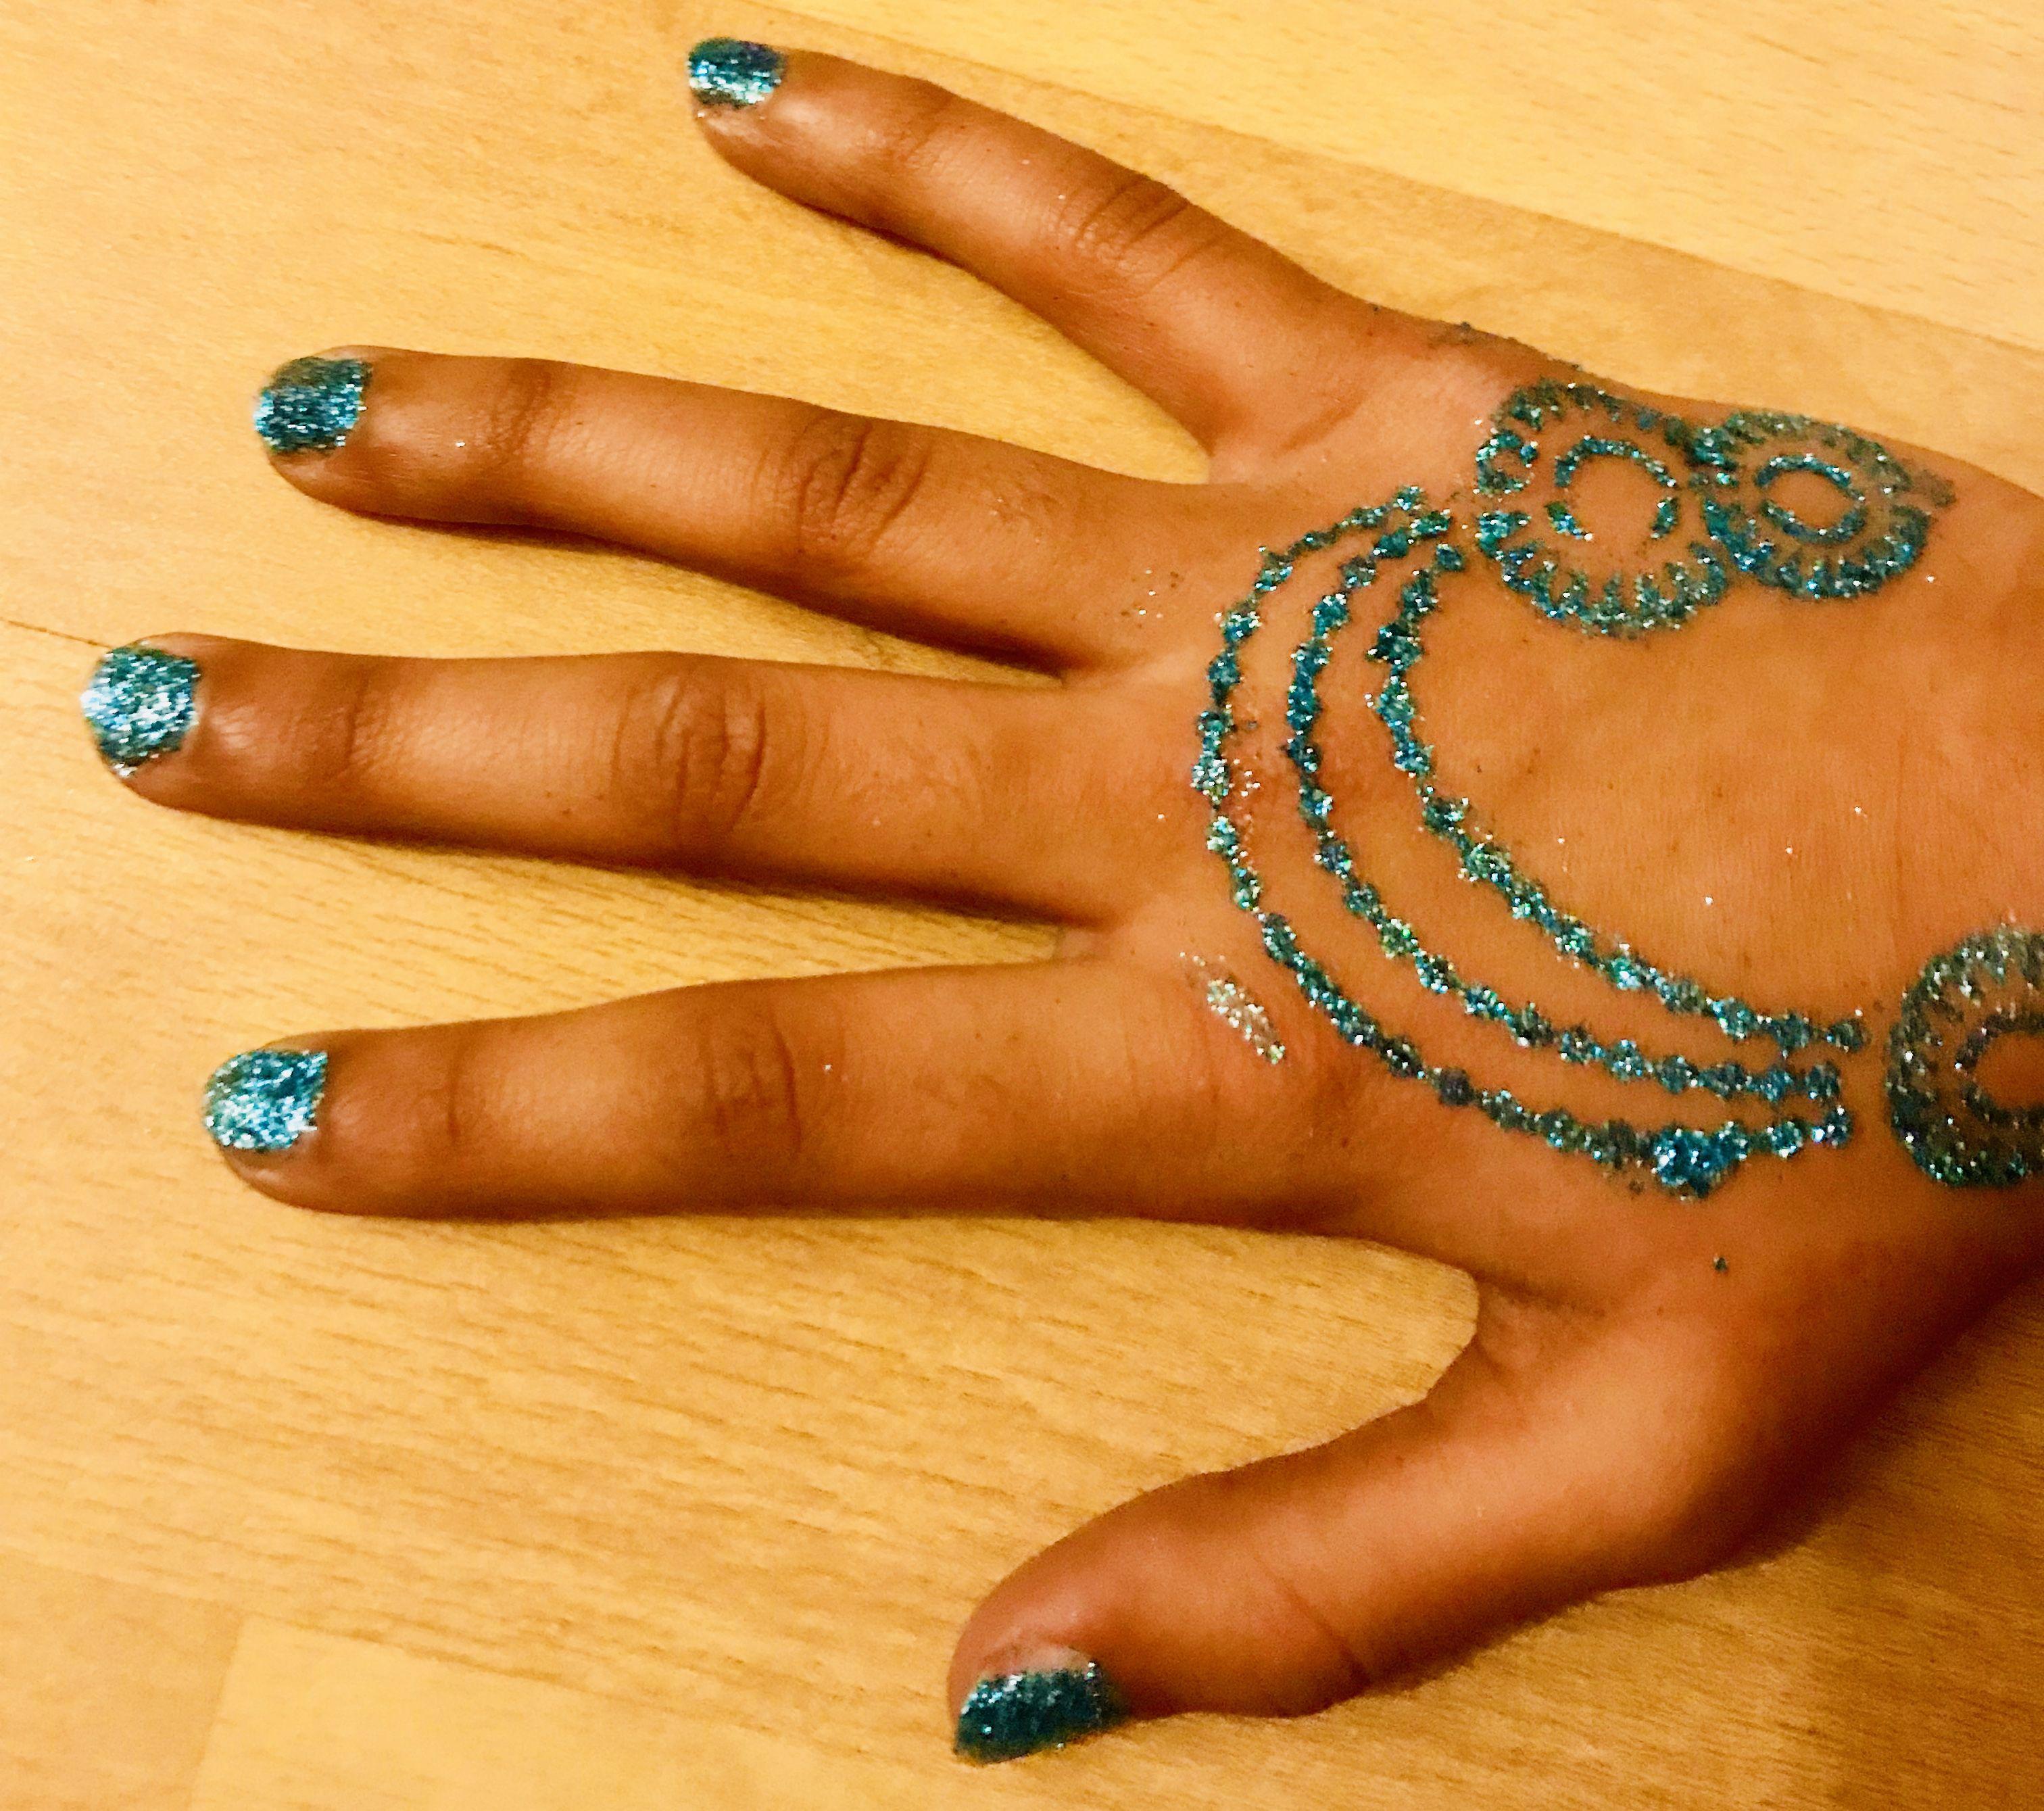 Henna Tattoo Cones For Sale: Pin On Easy Henna Stencils To Draw Around Using Henna